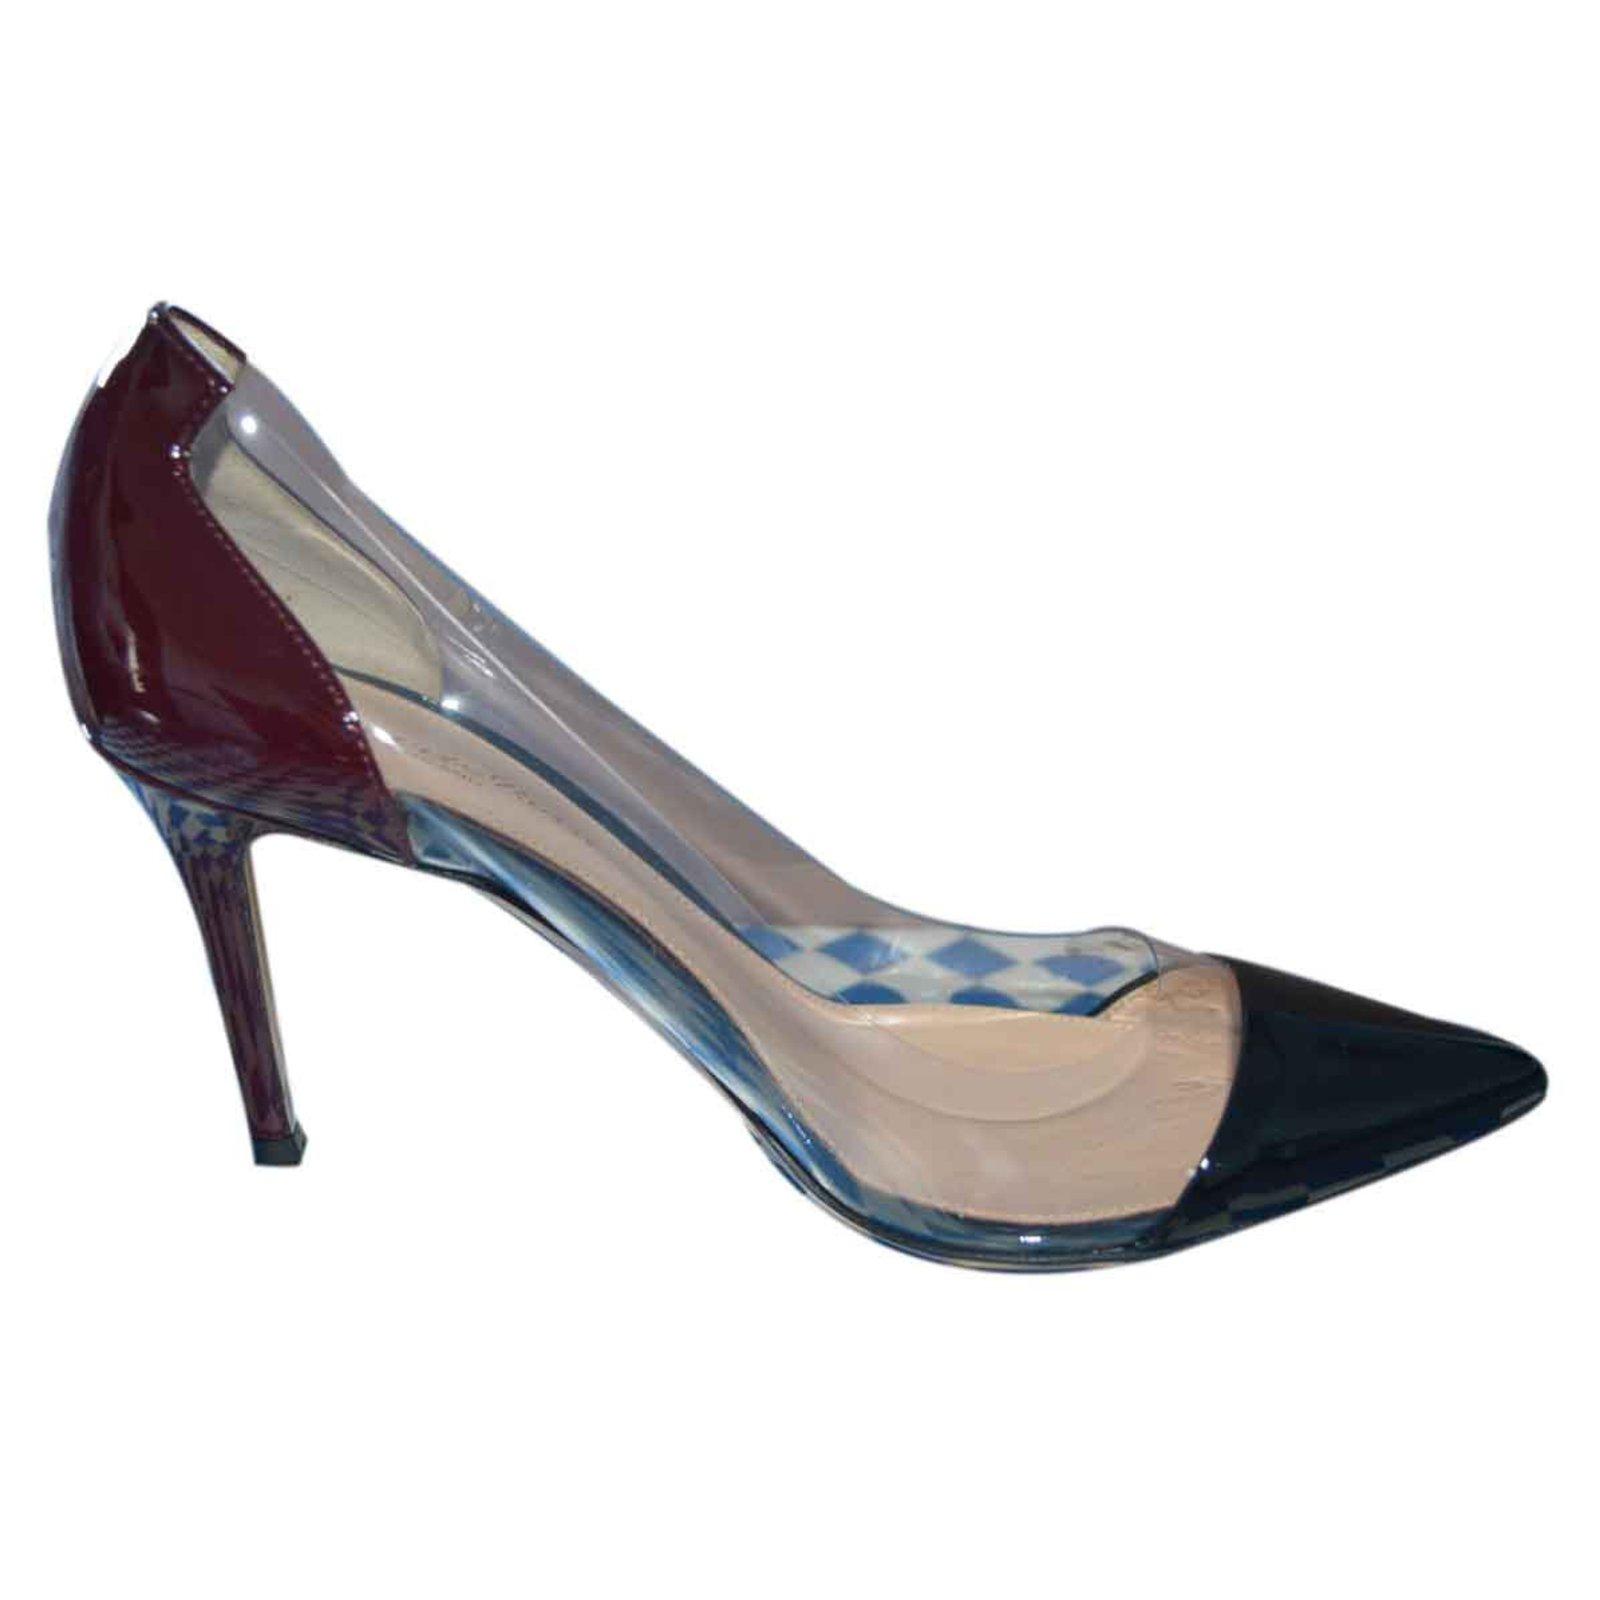 49b57c8919 Gianvito Rossi Plexi pumps hell 8 cm Heels Varnish Other ref.23471 - Joli  Closet